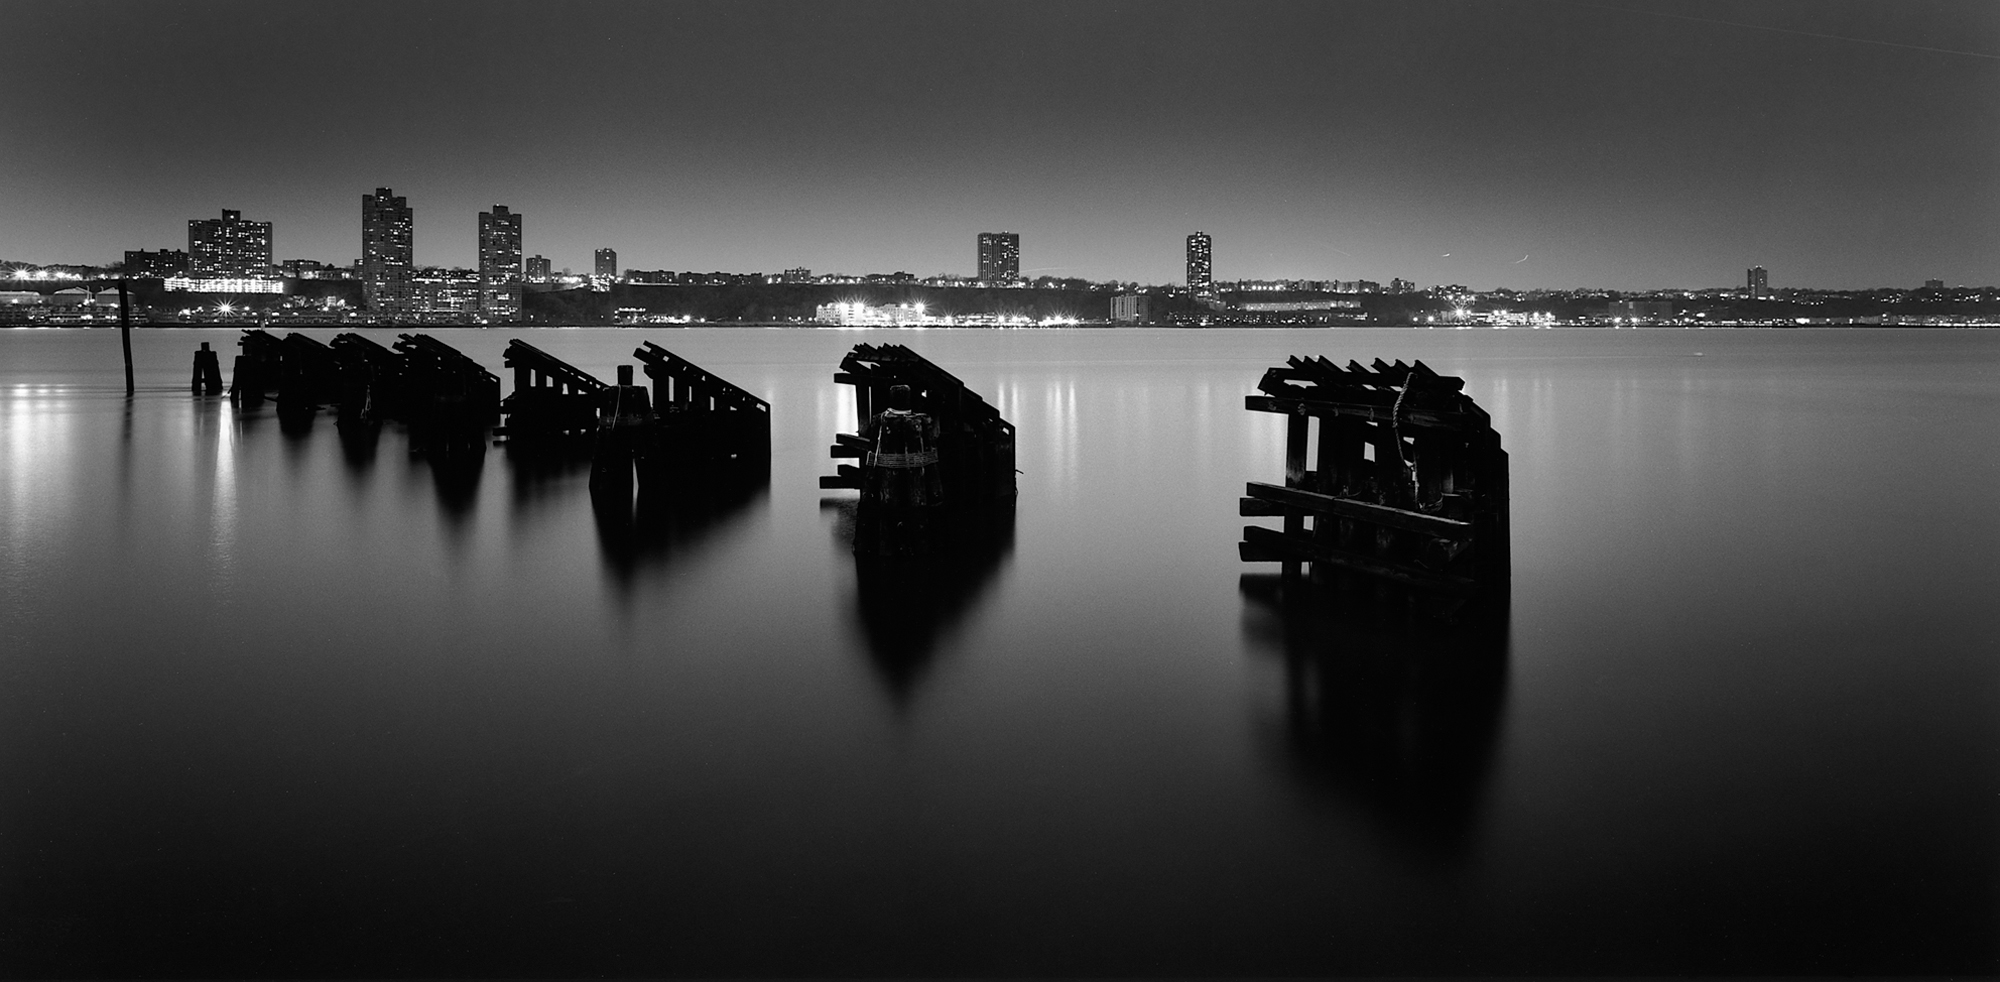 Fotografia e Arquitetura: Erieta Attali, Riverside Drive, NYC © Erieta Attali